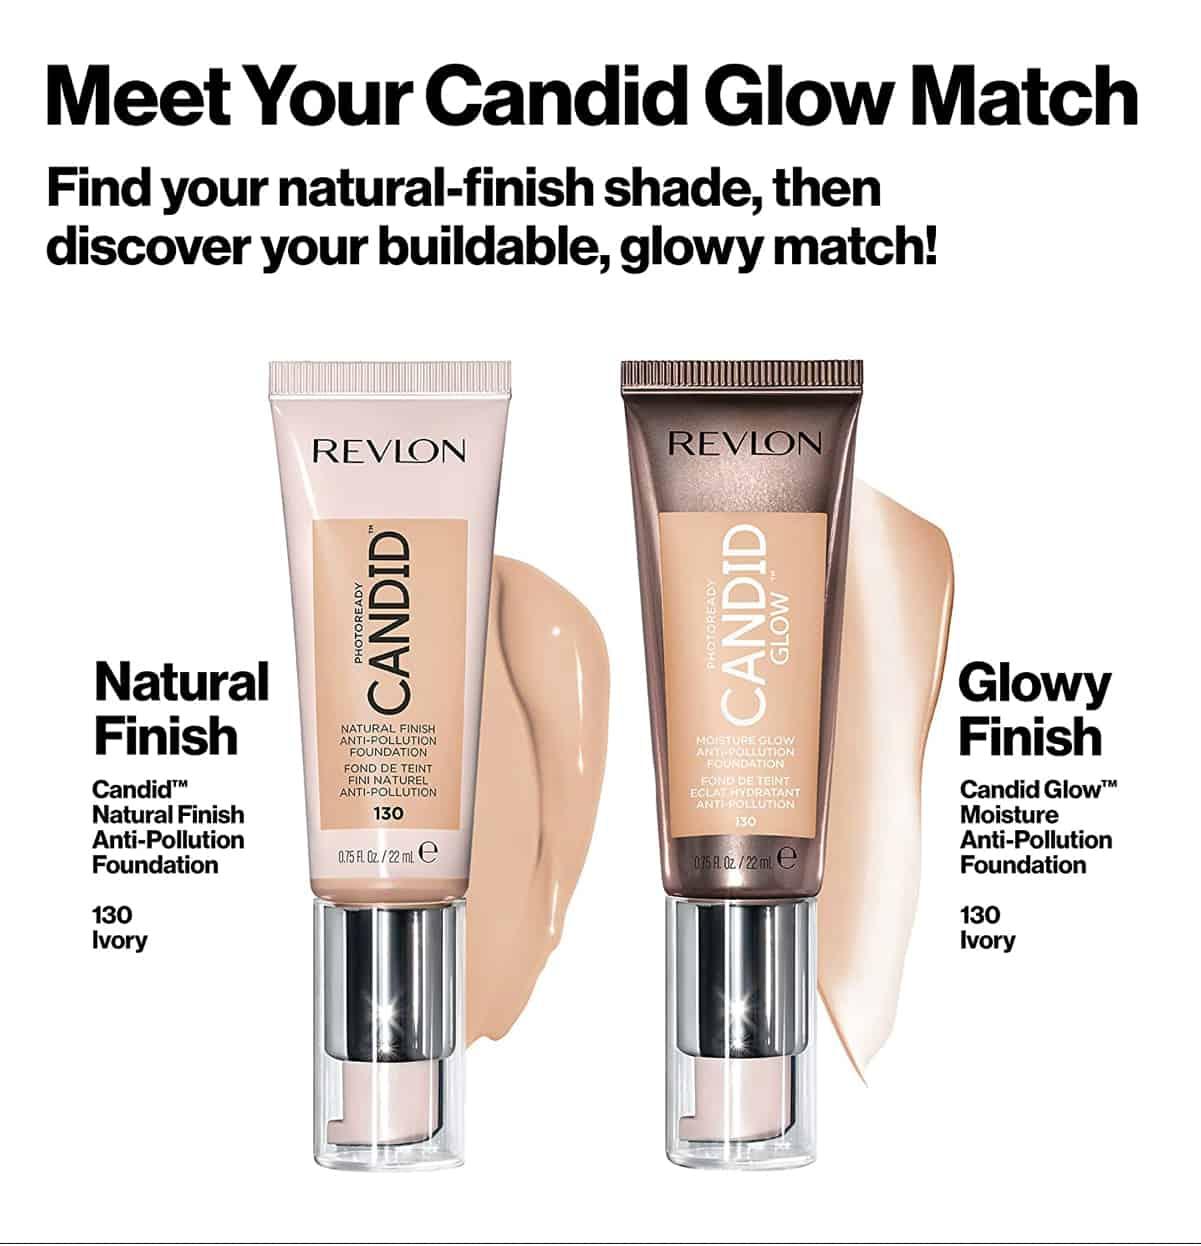 Revlon Candid Glow Moisture Glow Foundation